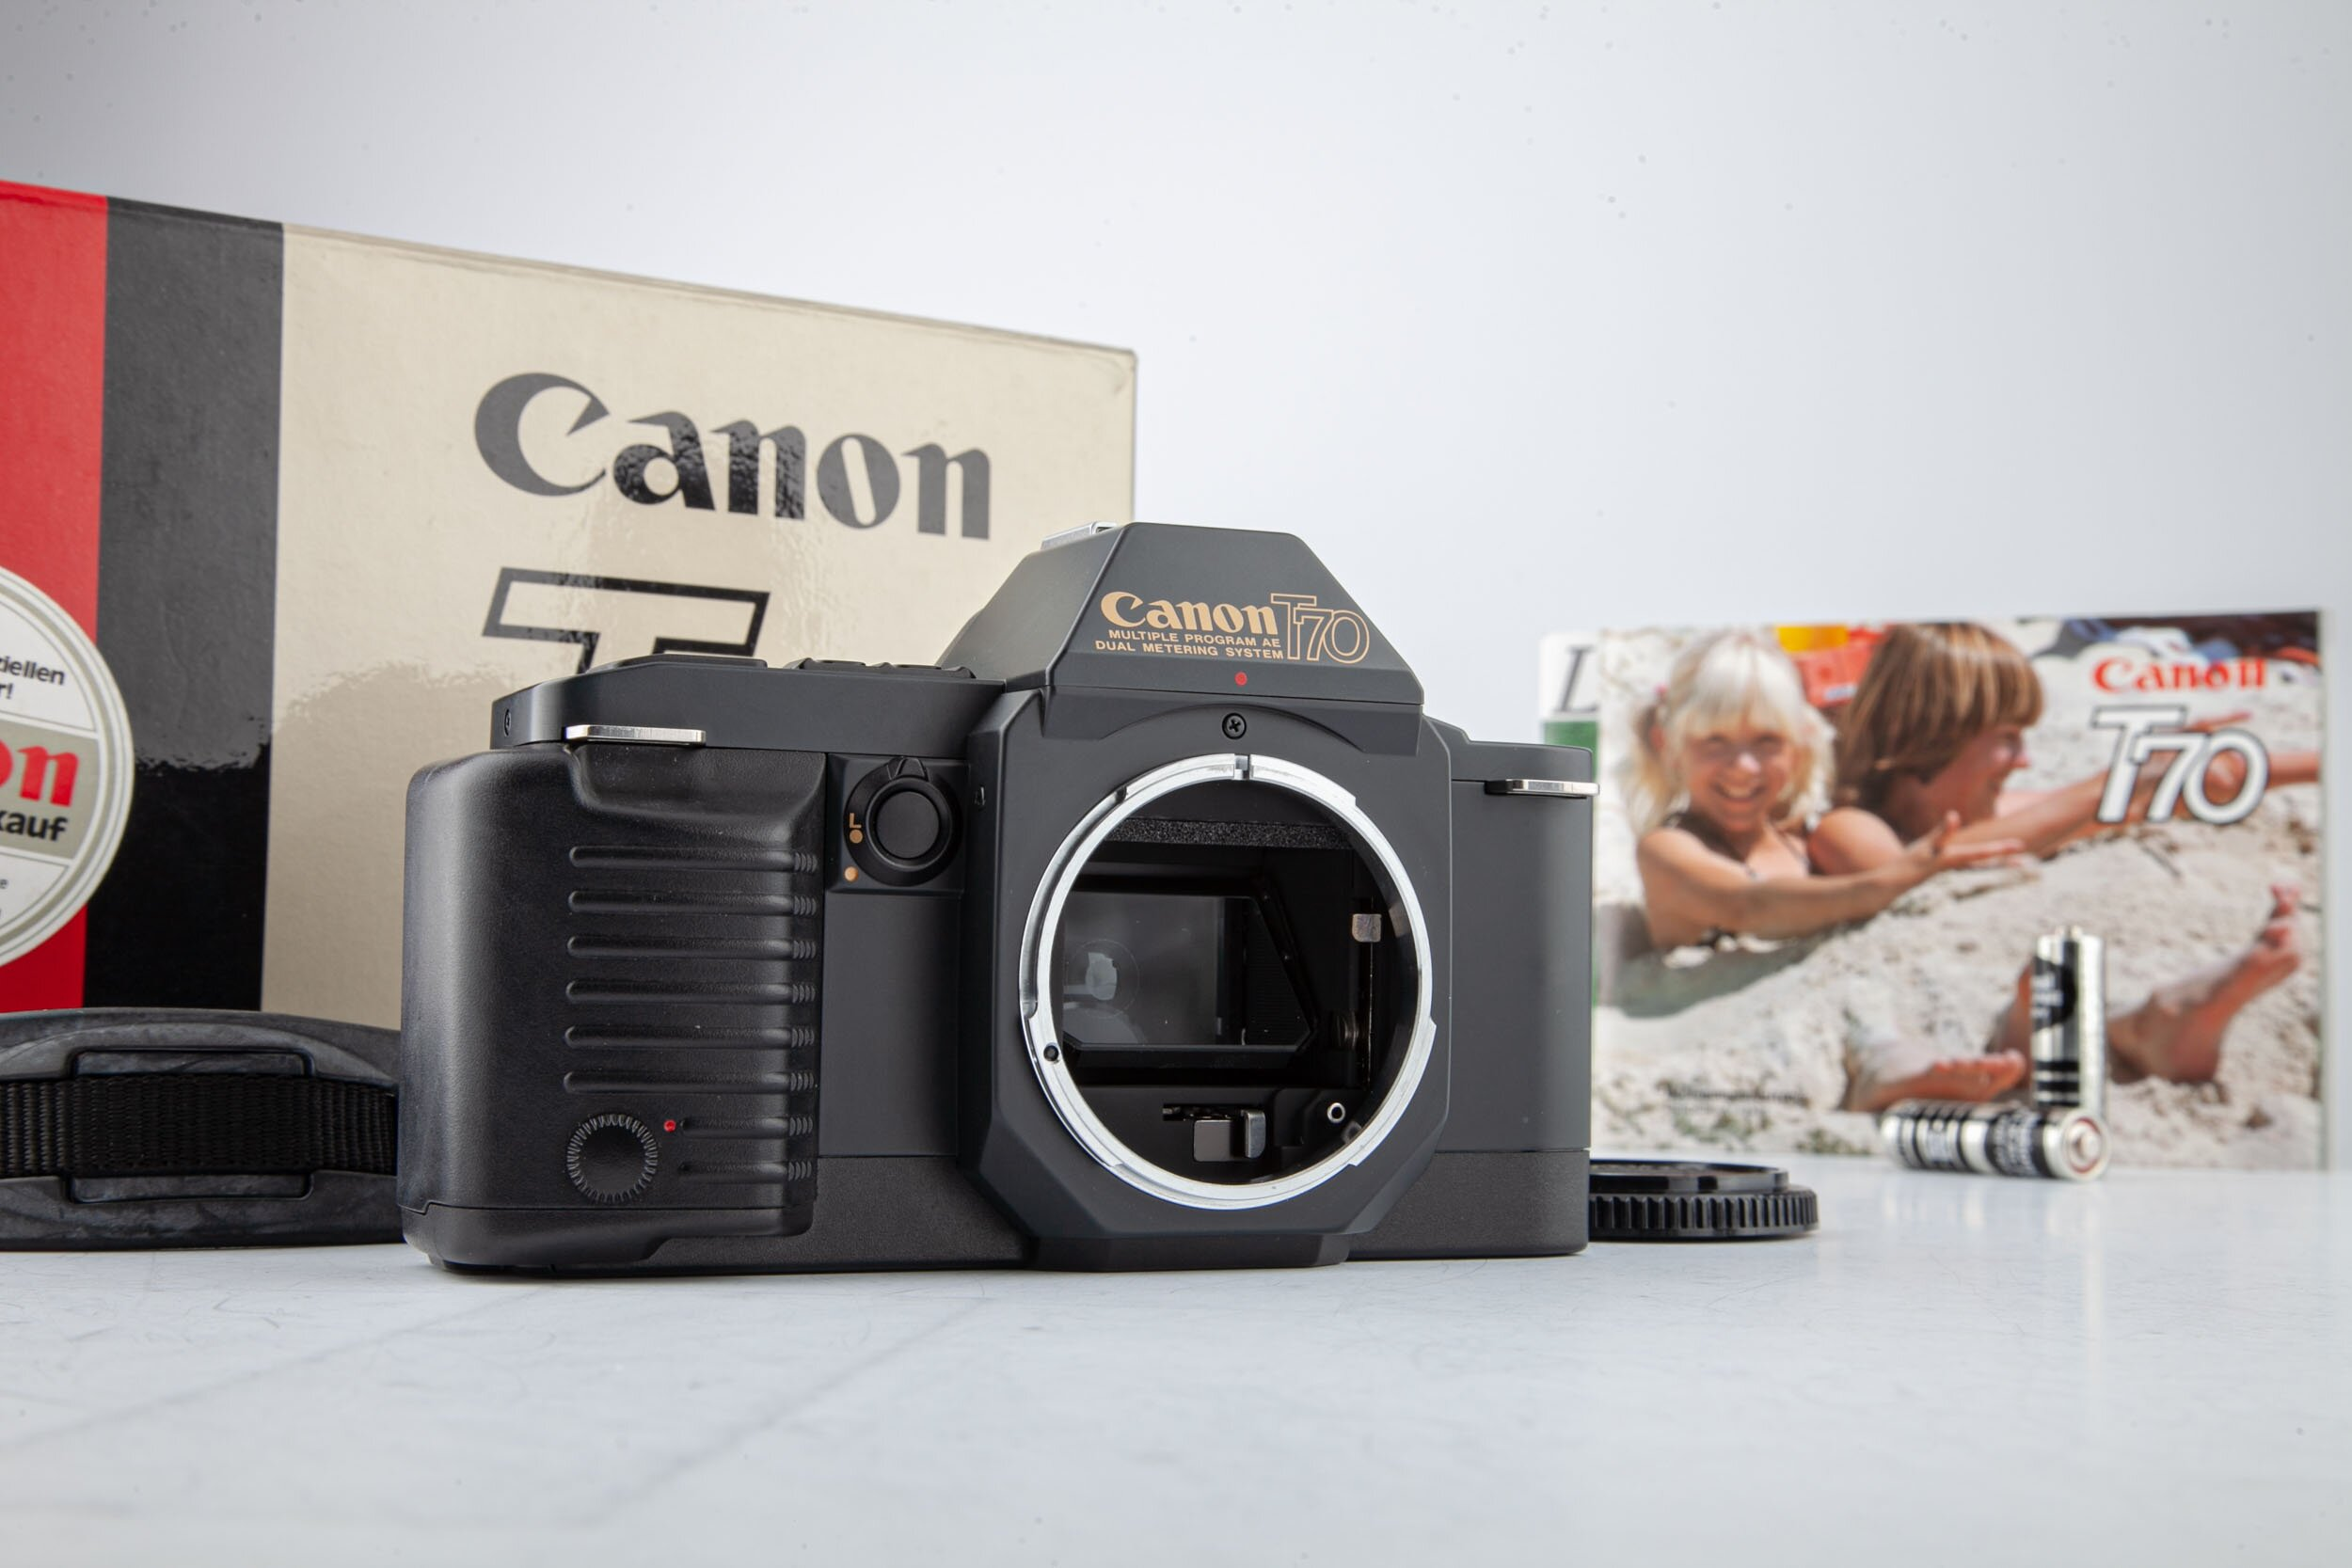 Canon T70 Gehäuse OVP